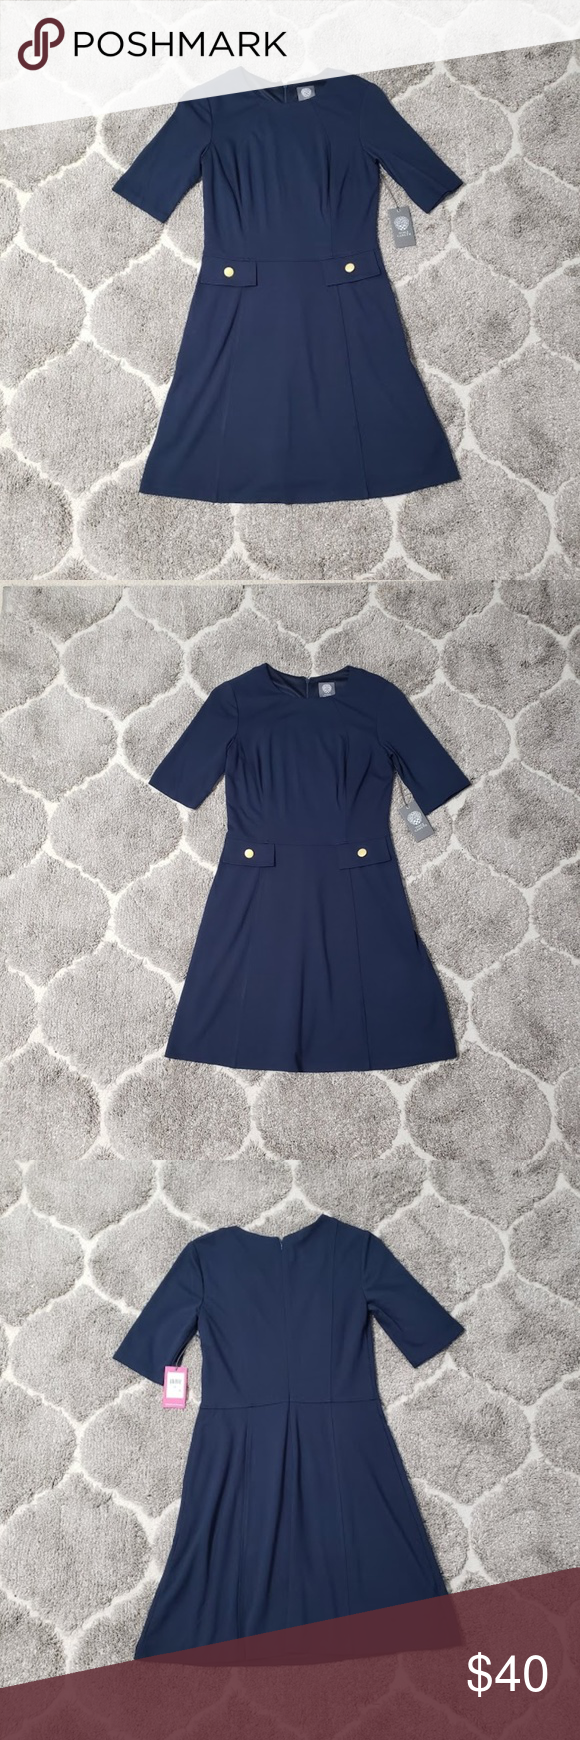 Vince Camuto Navy Knit Aline Dress Nwt Sz 8 Aline Dress Dresses Vince Camuto [ 1740 x 580 Pixel ]